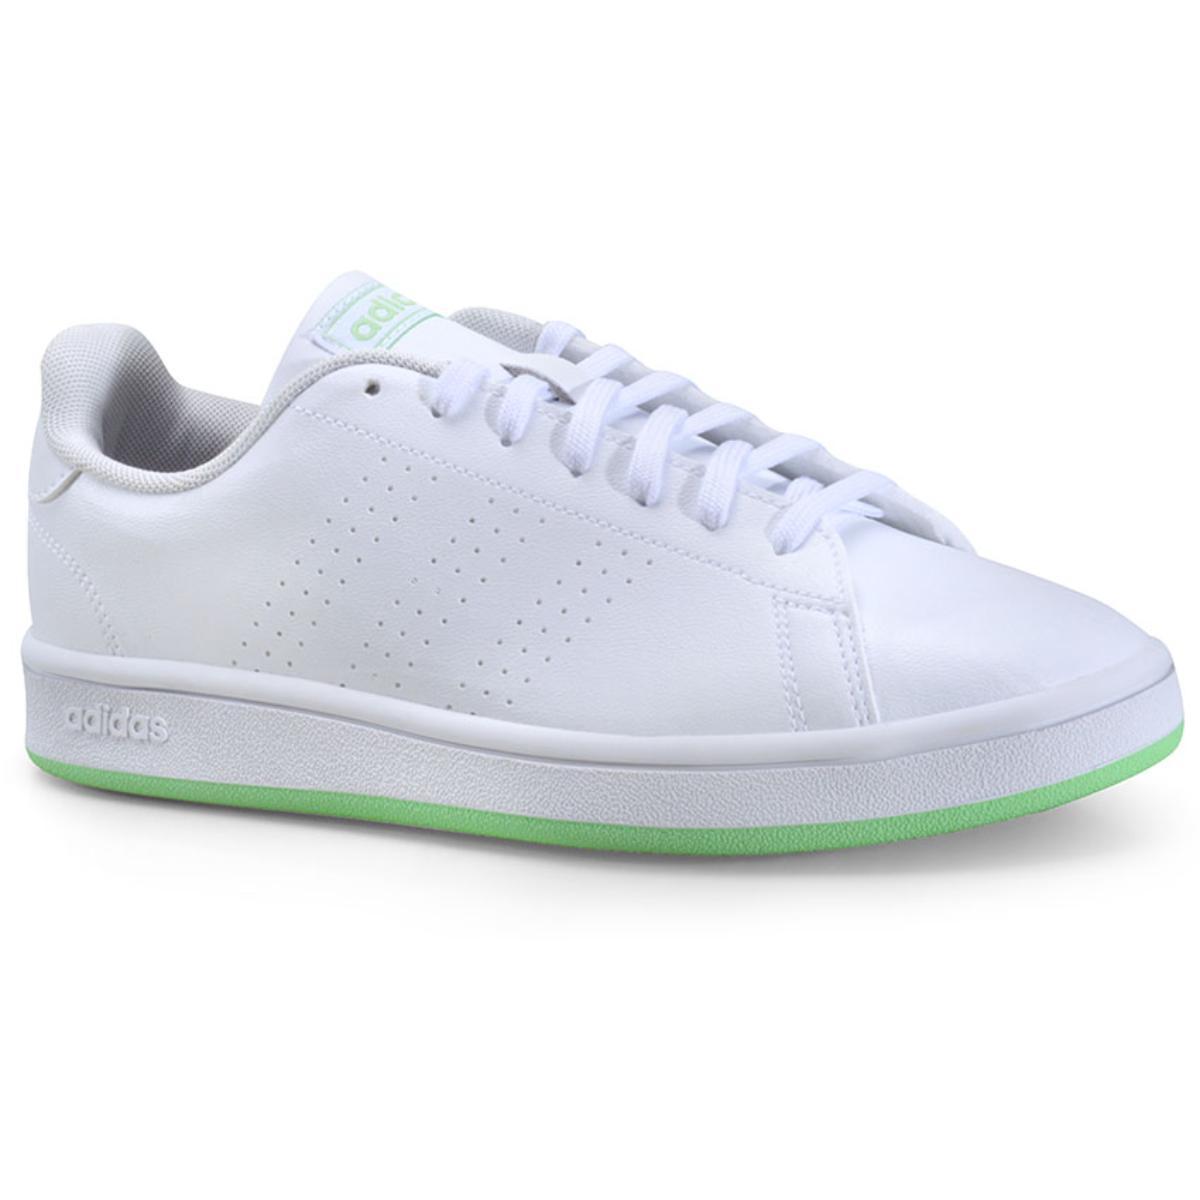 Tênis Feminino Adidas Fw0986 Advantage Base w Branco/verde